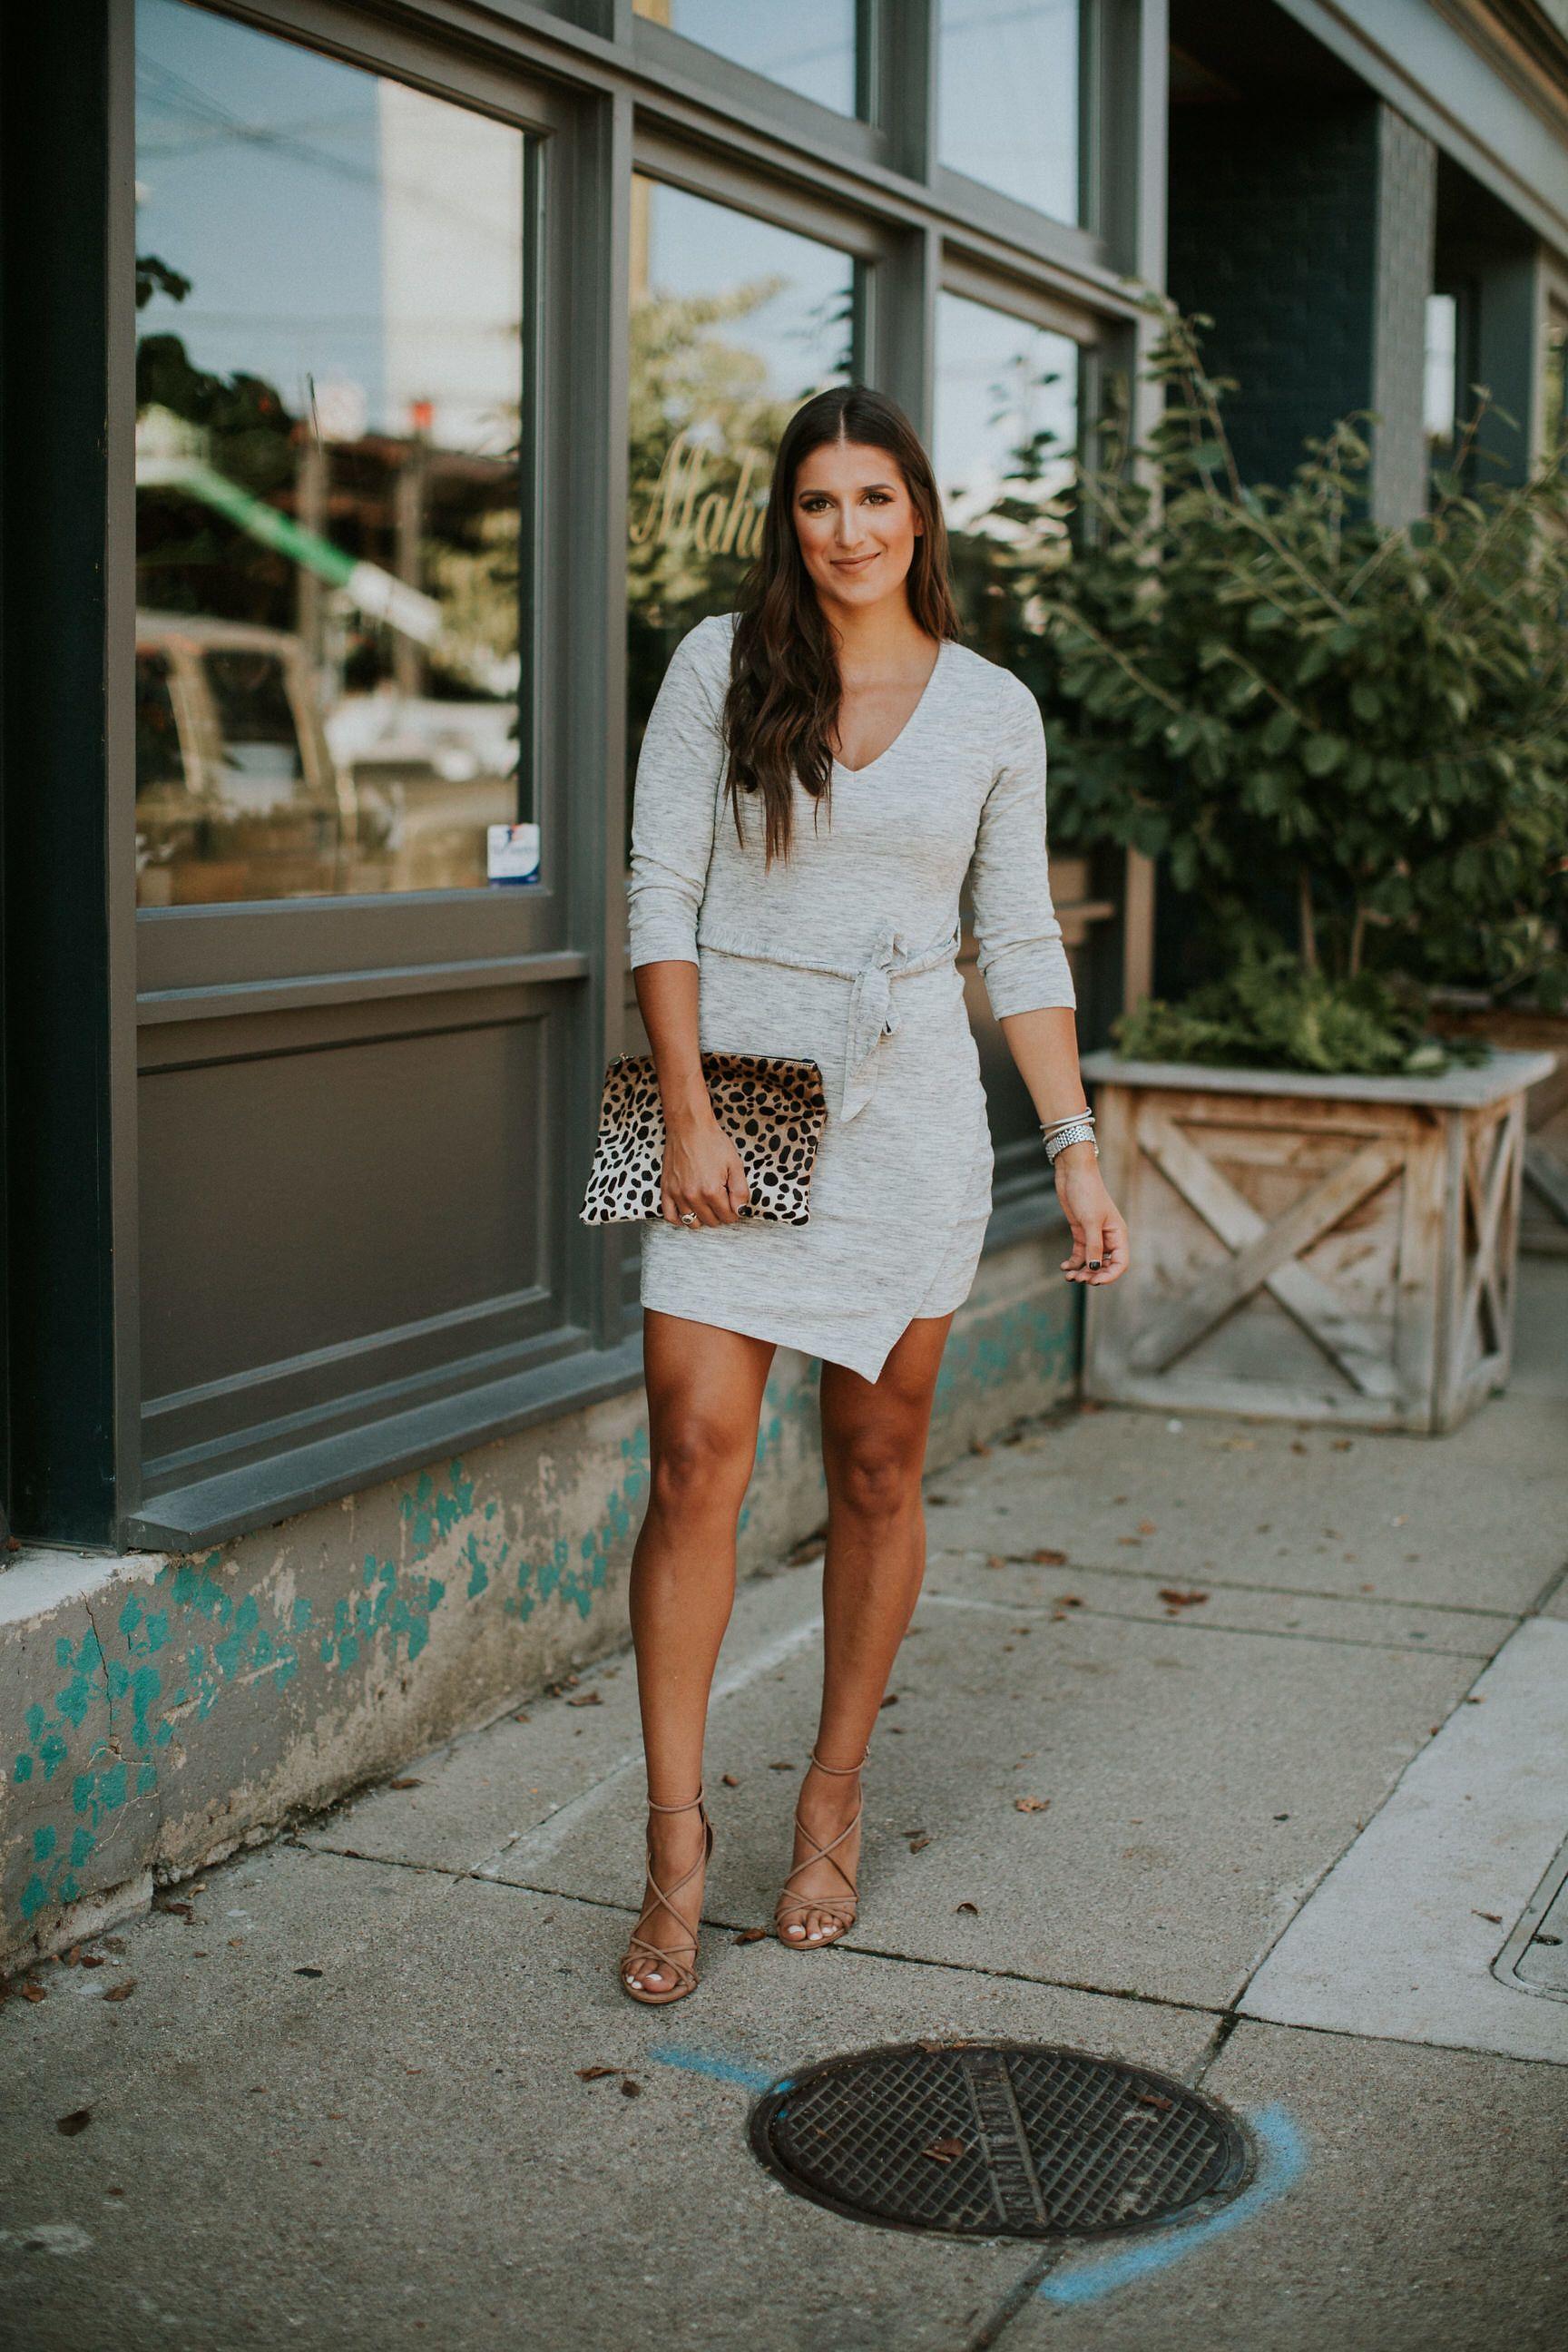 Sweater Wrap Dress A Southern Drawl Wrap Sweater Dress Grey Knit Dress Fashion [ 2592 x 1728 Pixel ]